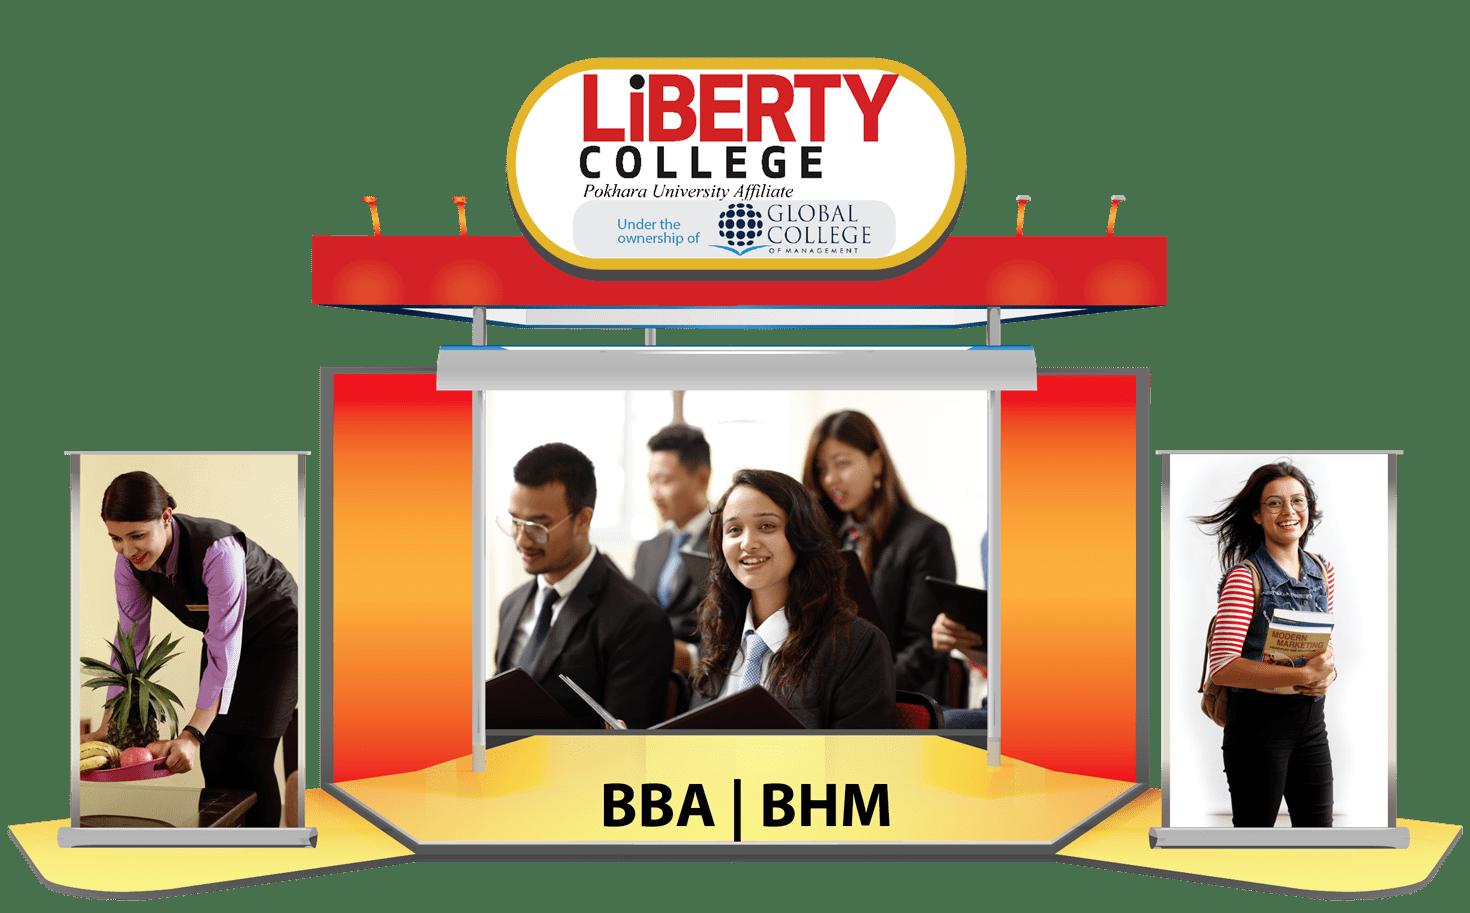 Liberty College